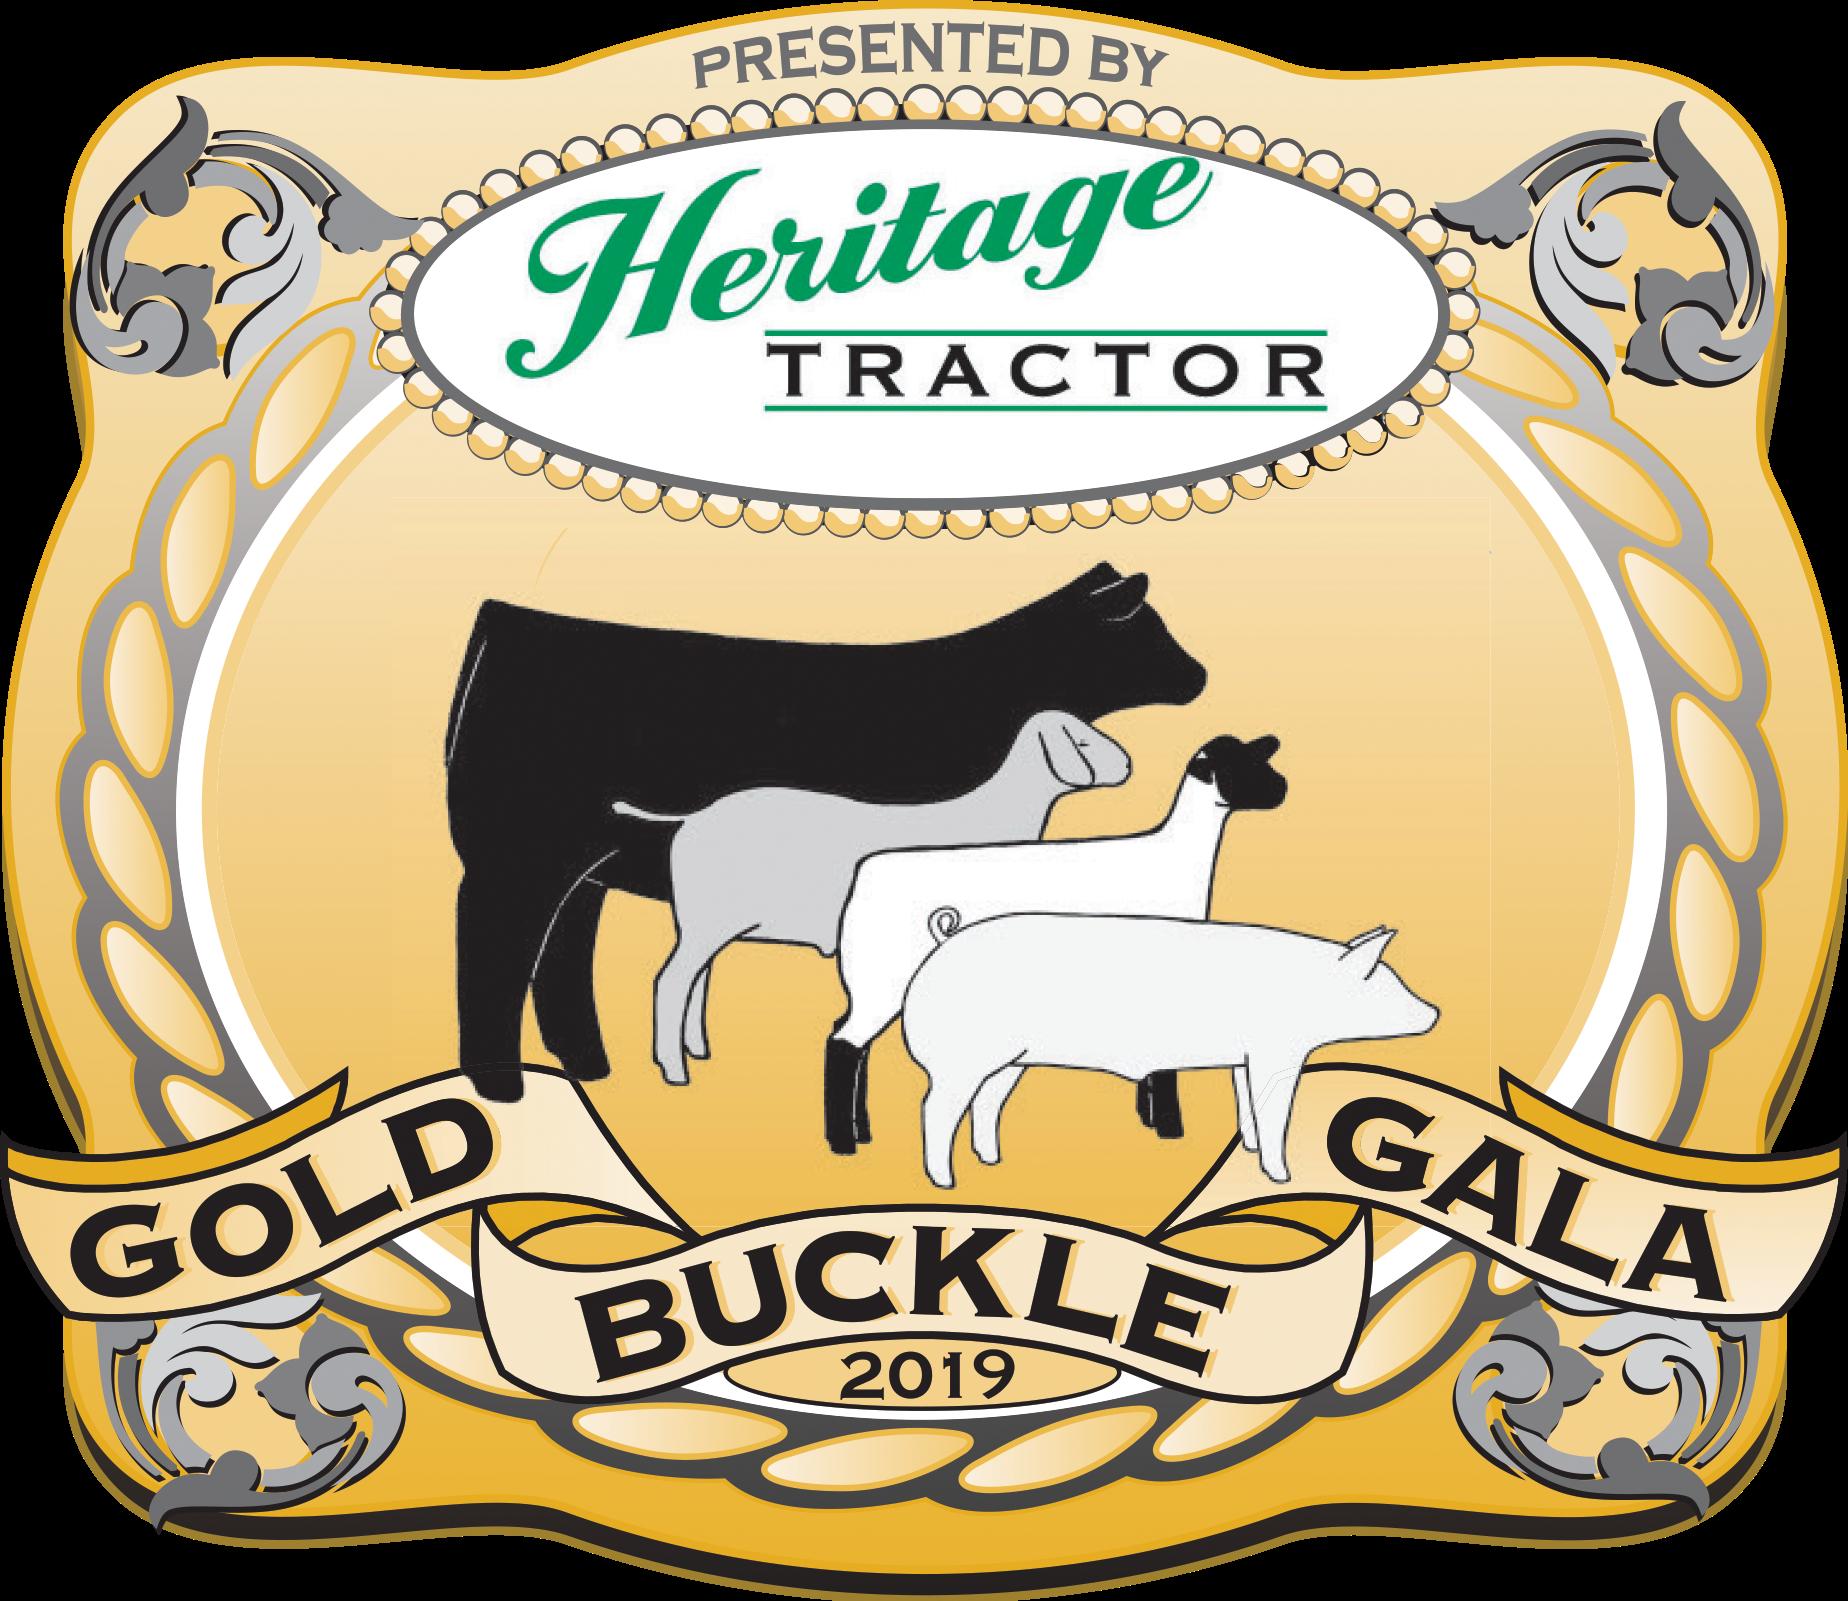 Gold Buckle Gala logo